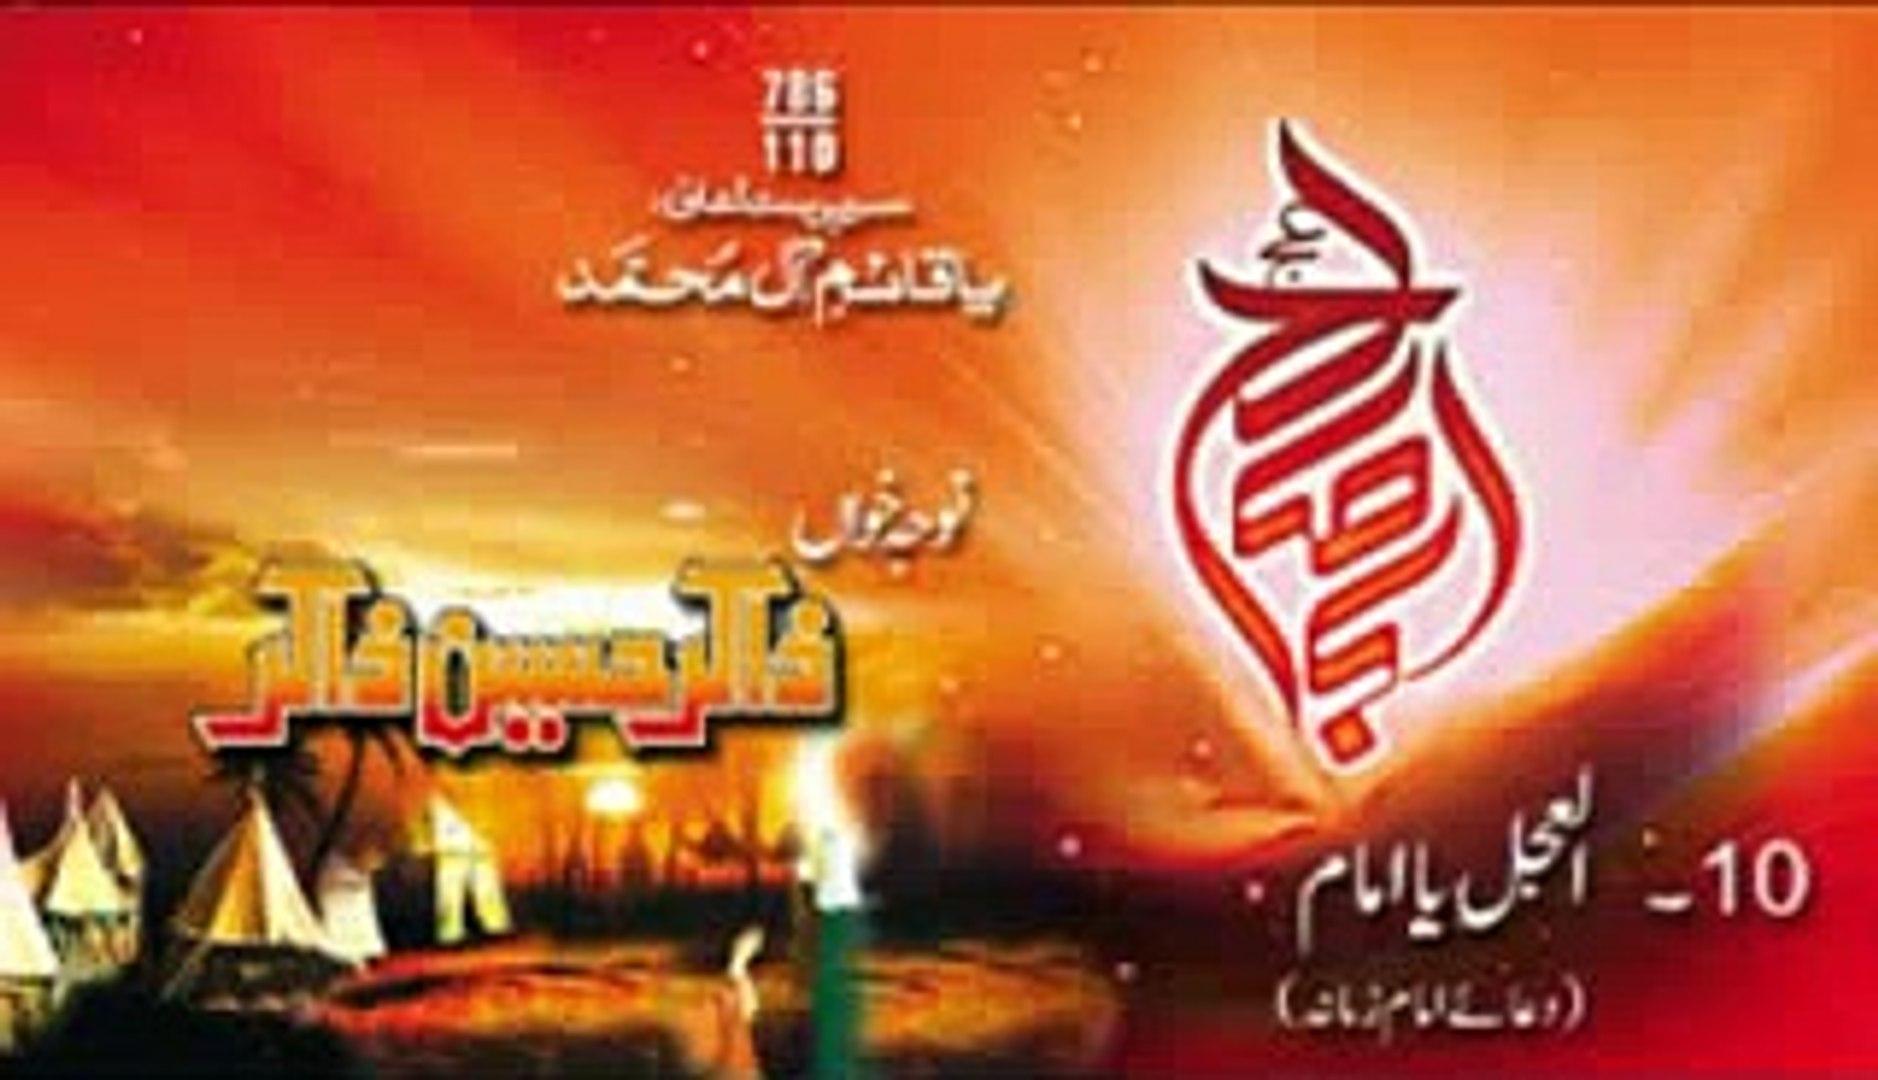 Al ajal ya imam Video Noha by Zakir Hussain Zakir 2015